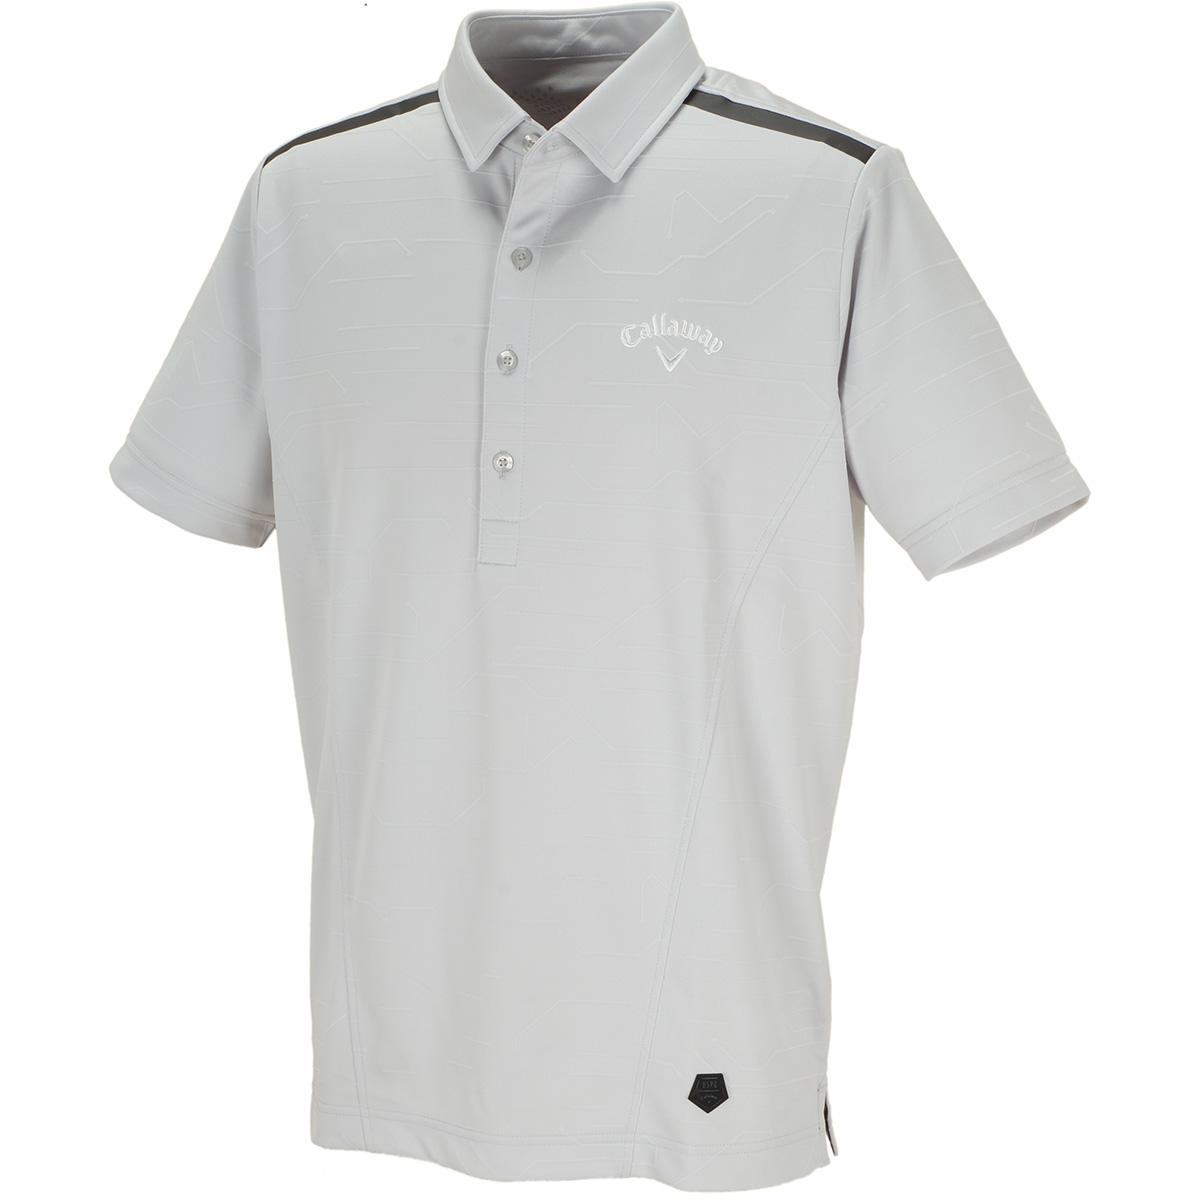 AI柄 ジャカード 半袖ポロシャツ